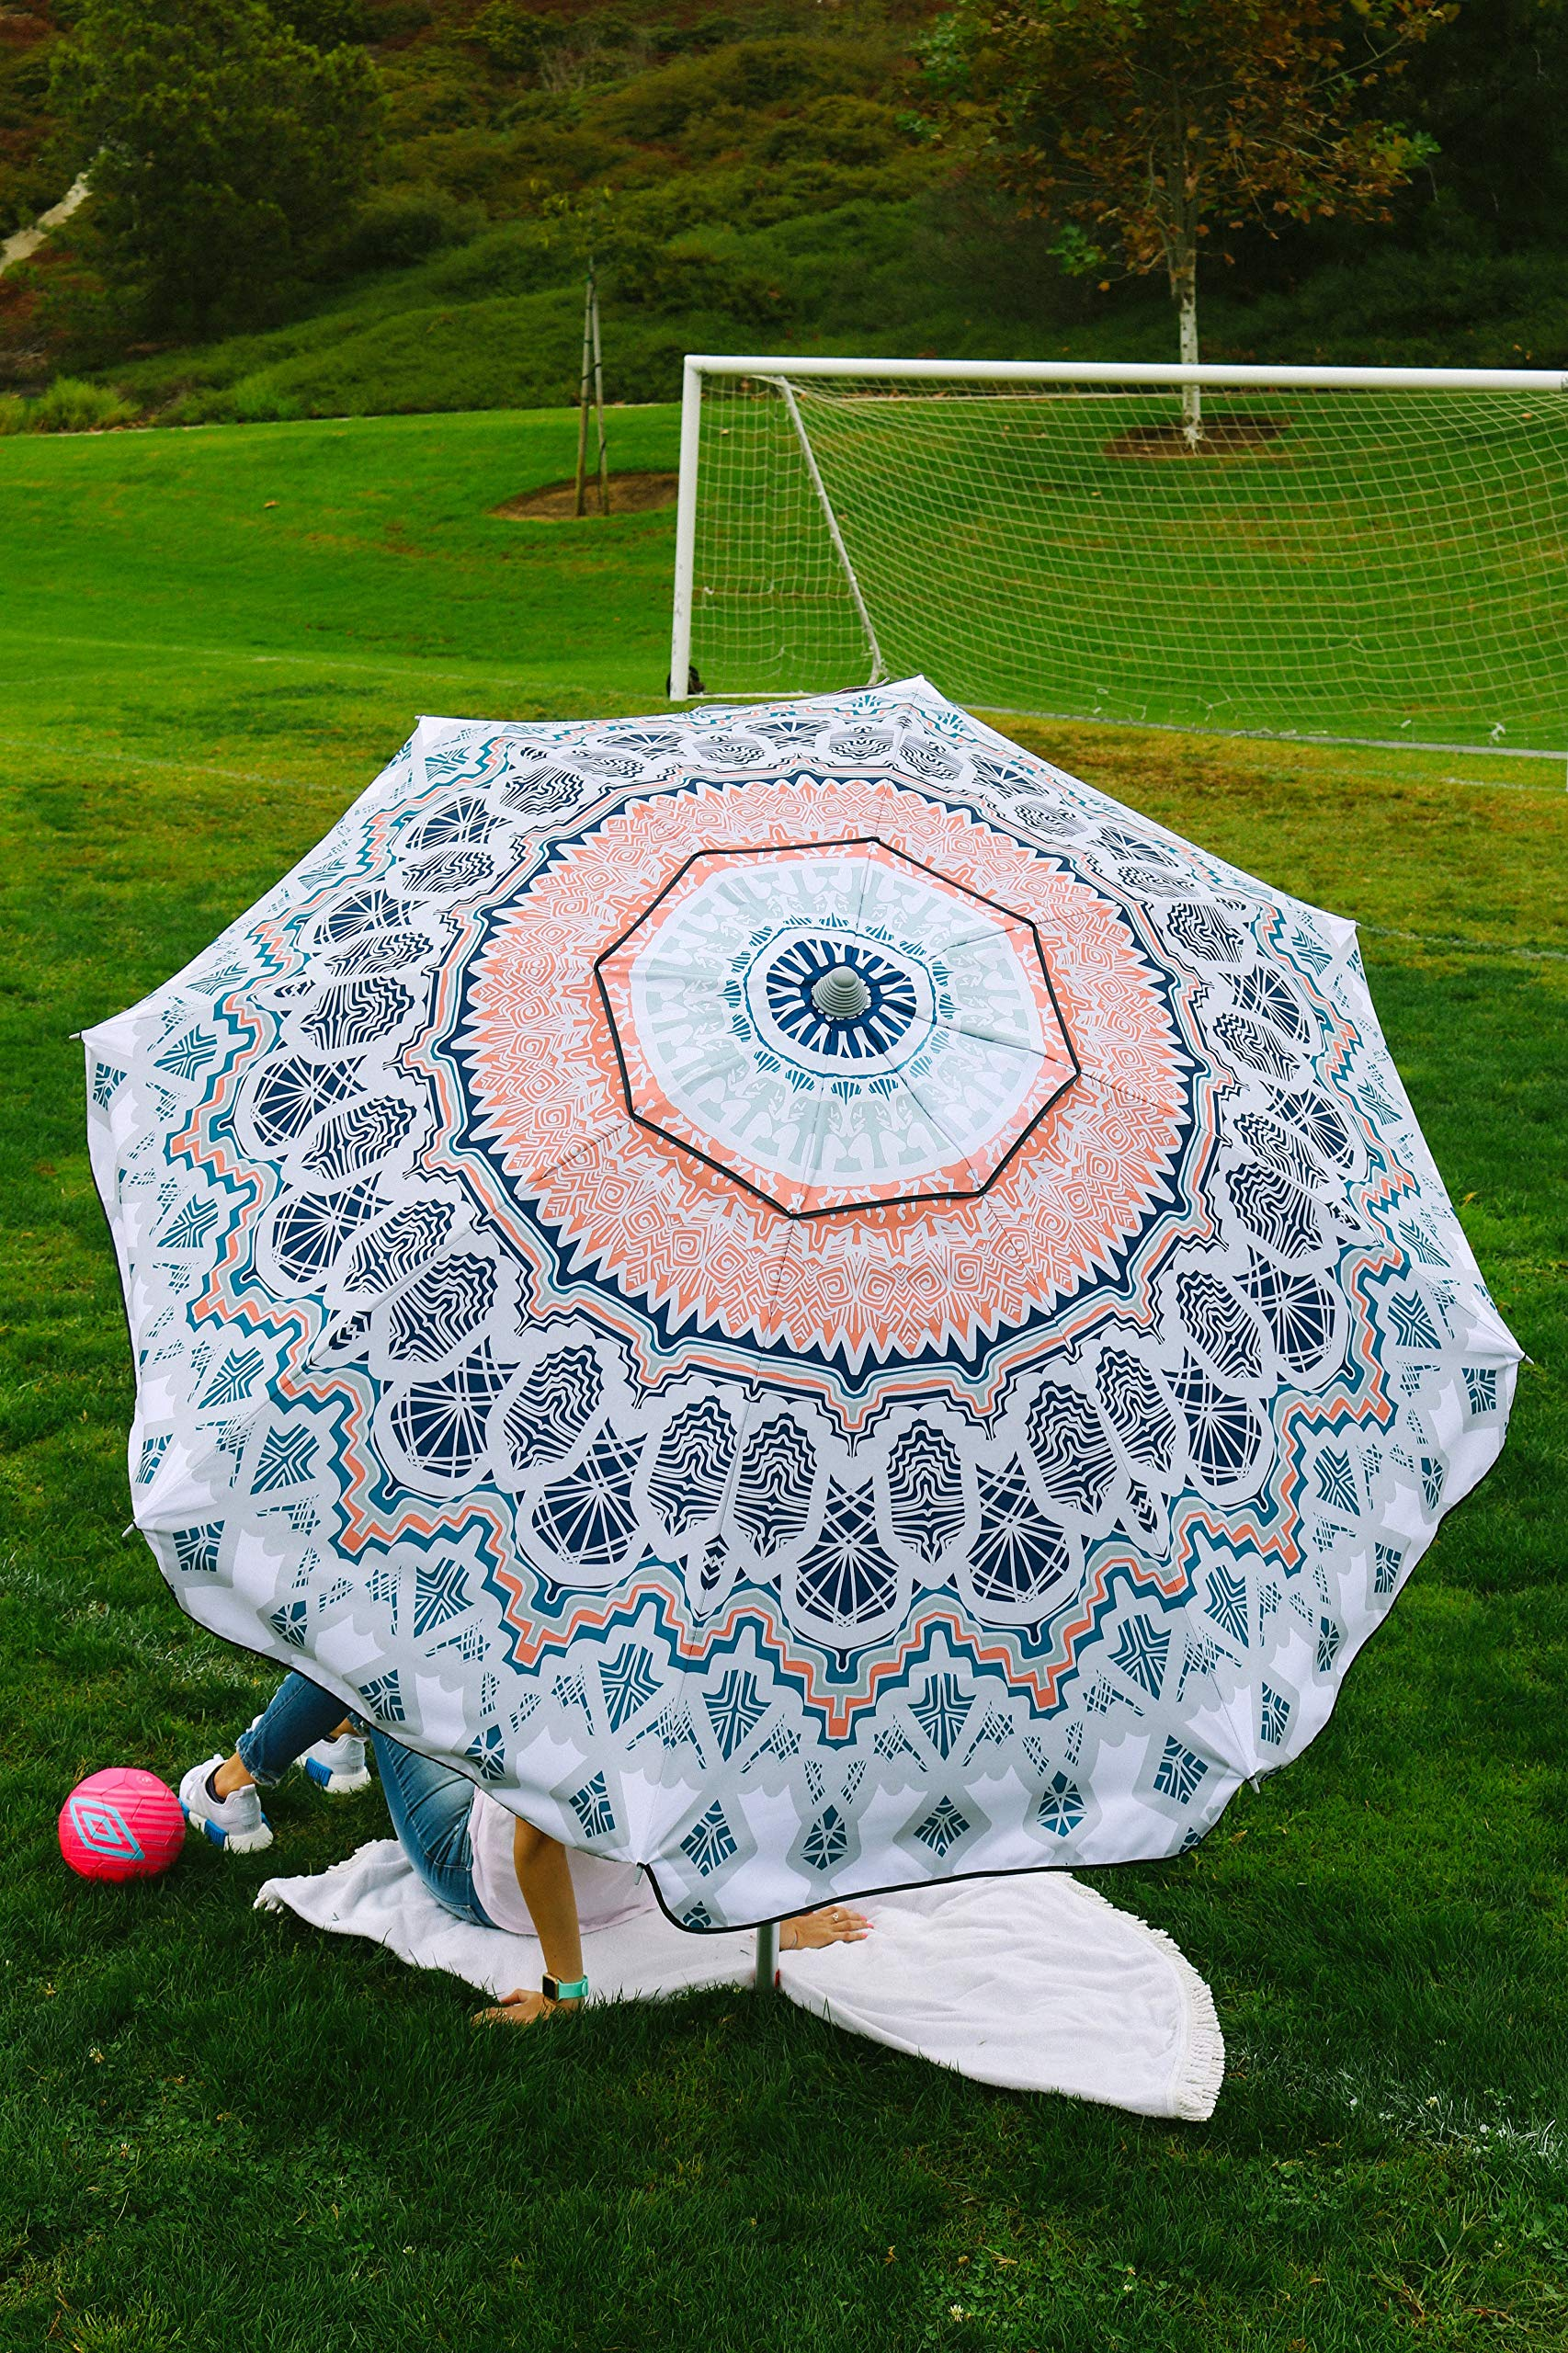 Beach and Grass Umbrella with Matching Travel Carrying Bag - Large 7 Feet 5 Inches Tilting Telescopic Aluminum Pole - Twist Sand/Grass Anchor - Wind Air Vent - Fiberglass Ribs (Paisley Wanderlust)